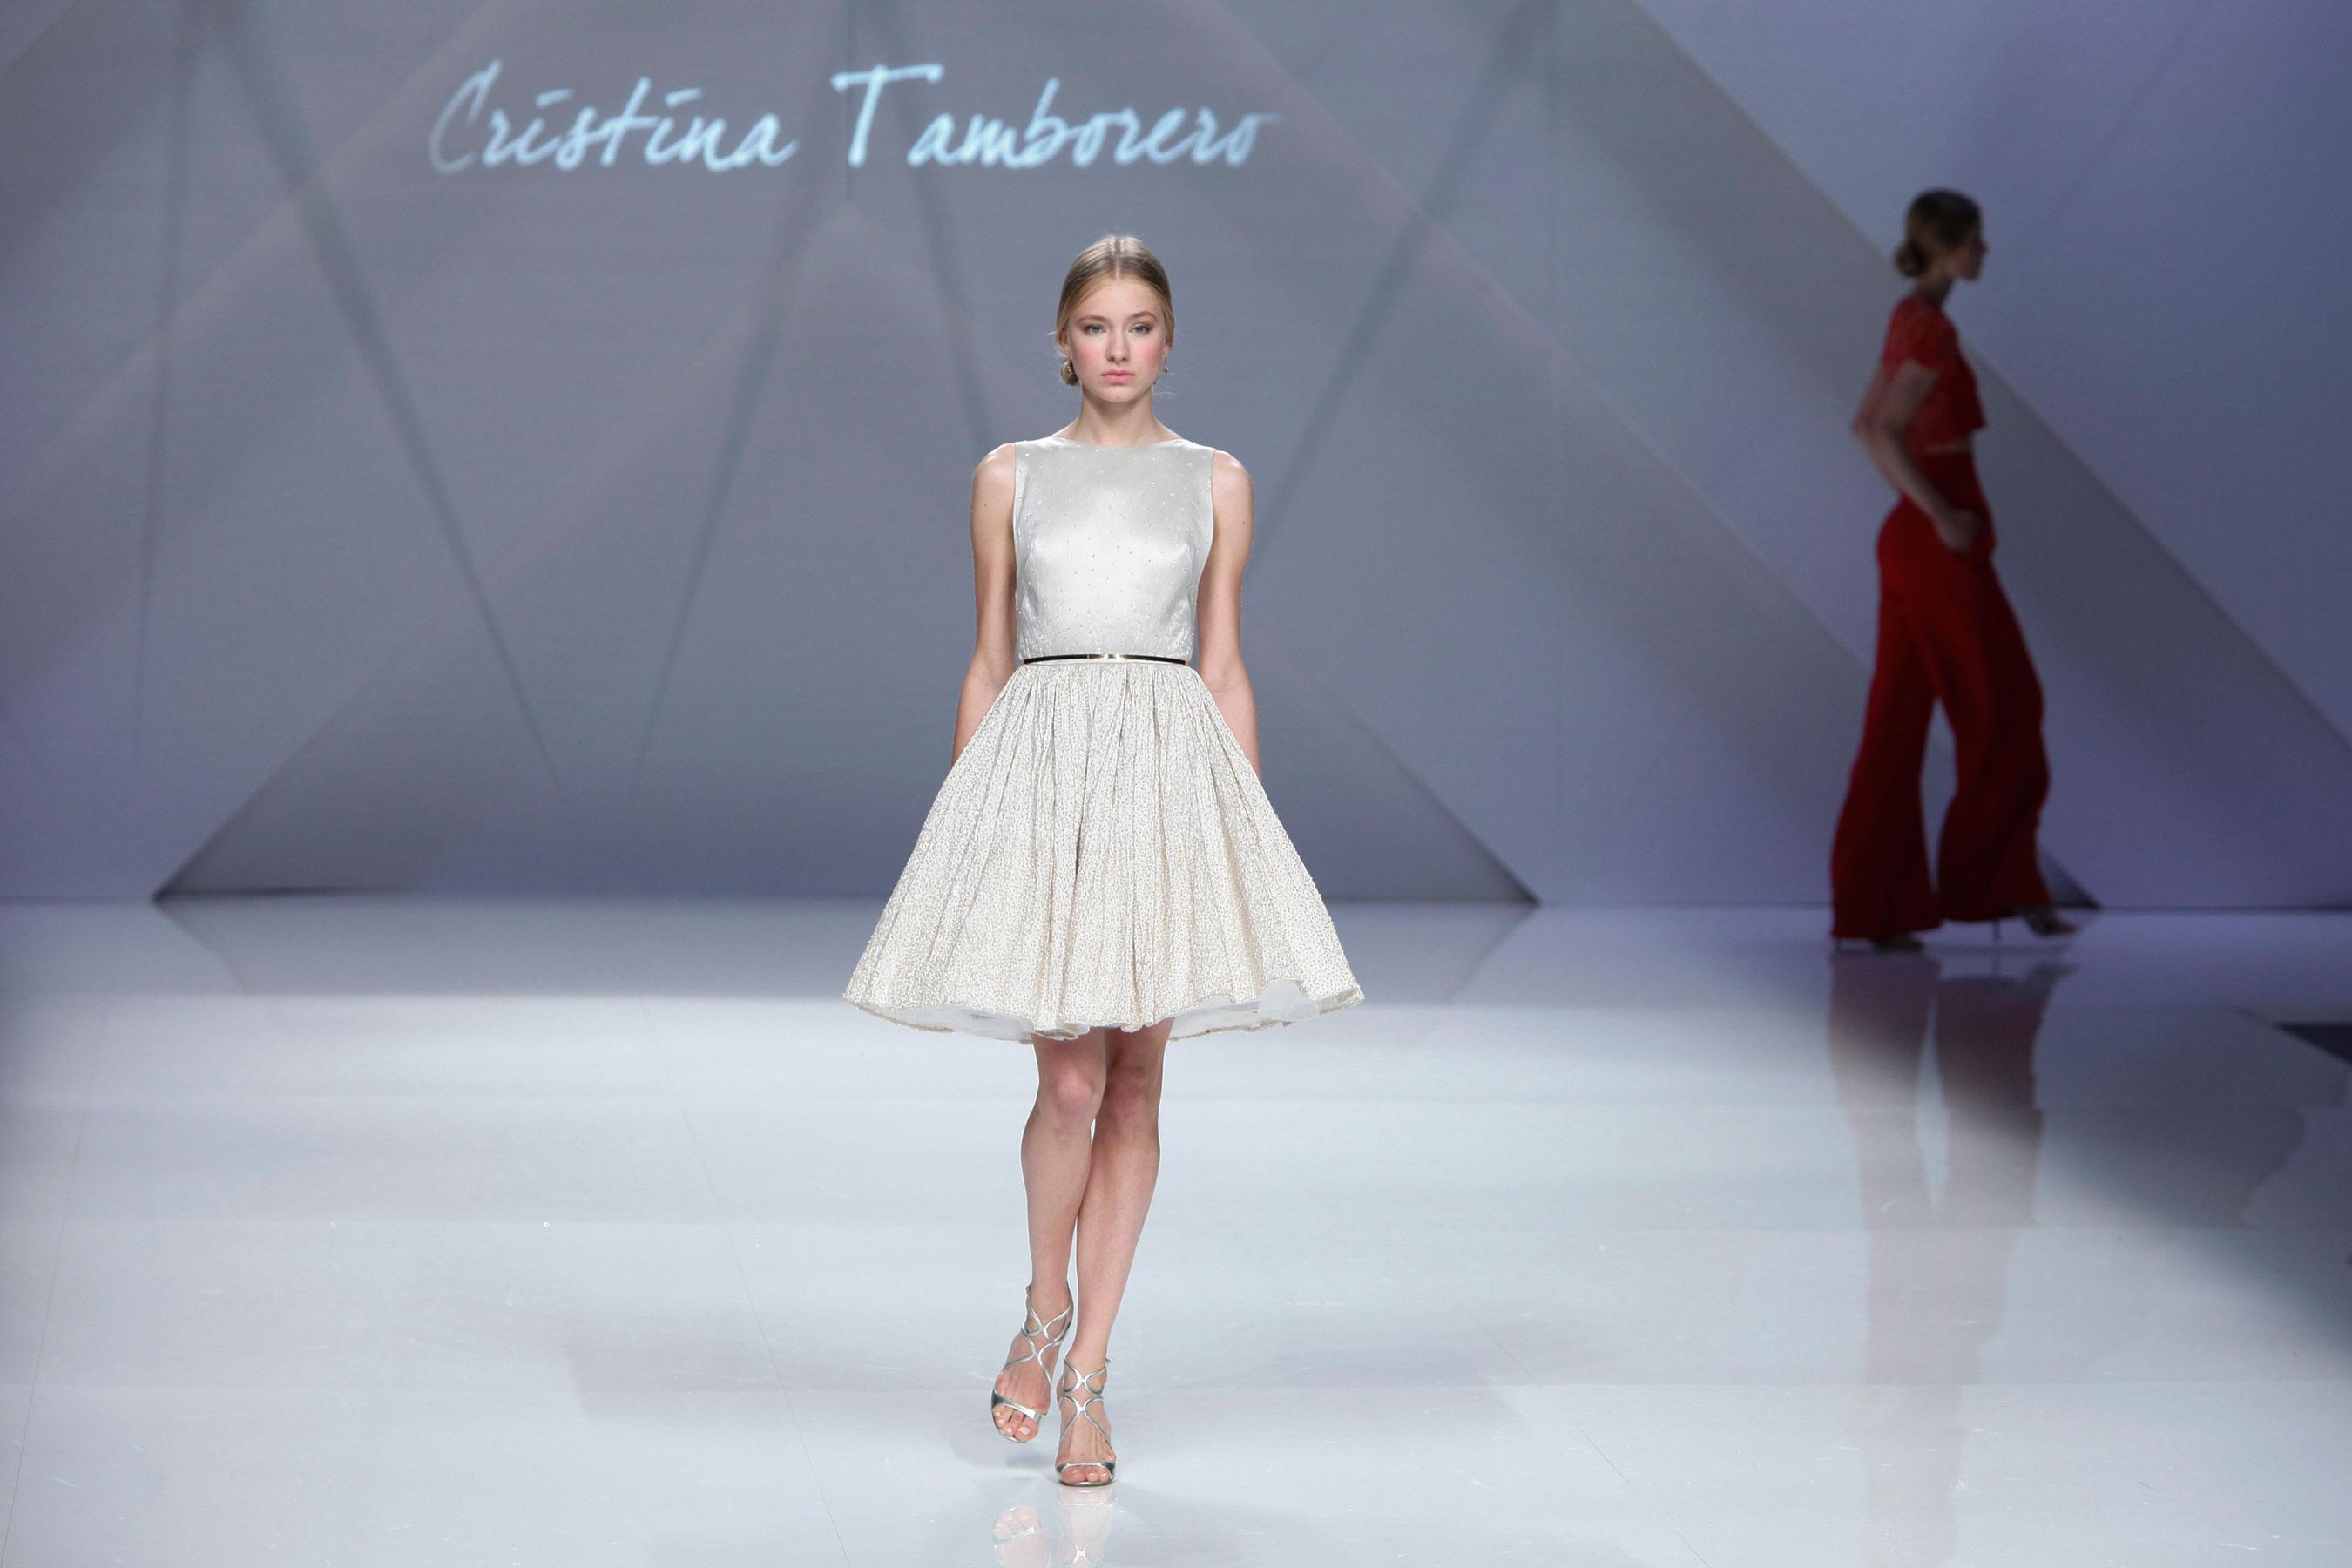 Cristina Tamborero brd RS17 449